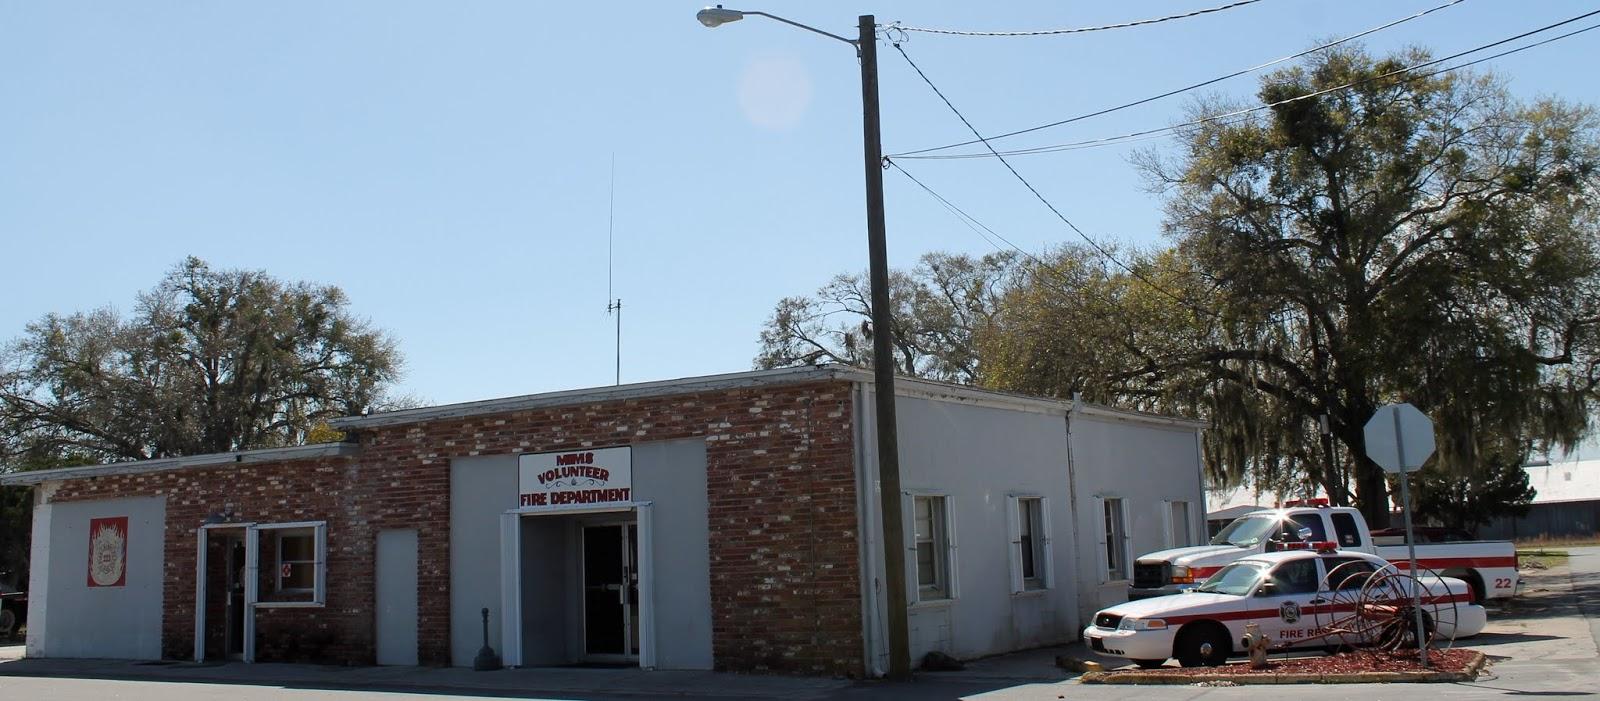 Estación de bomberos en Mims